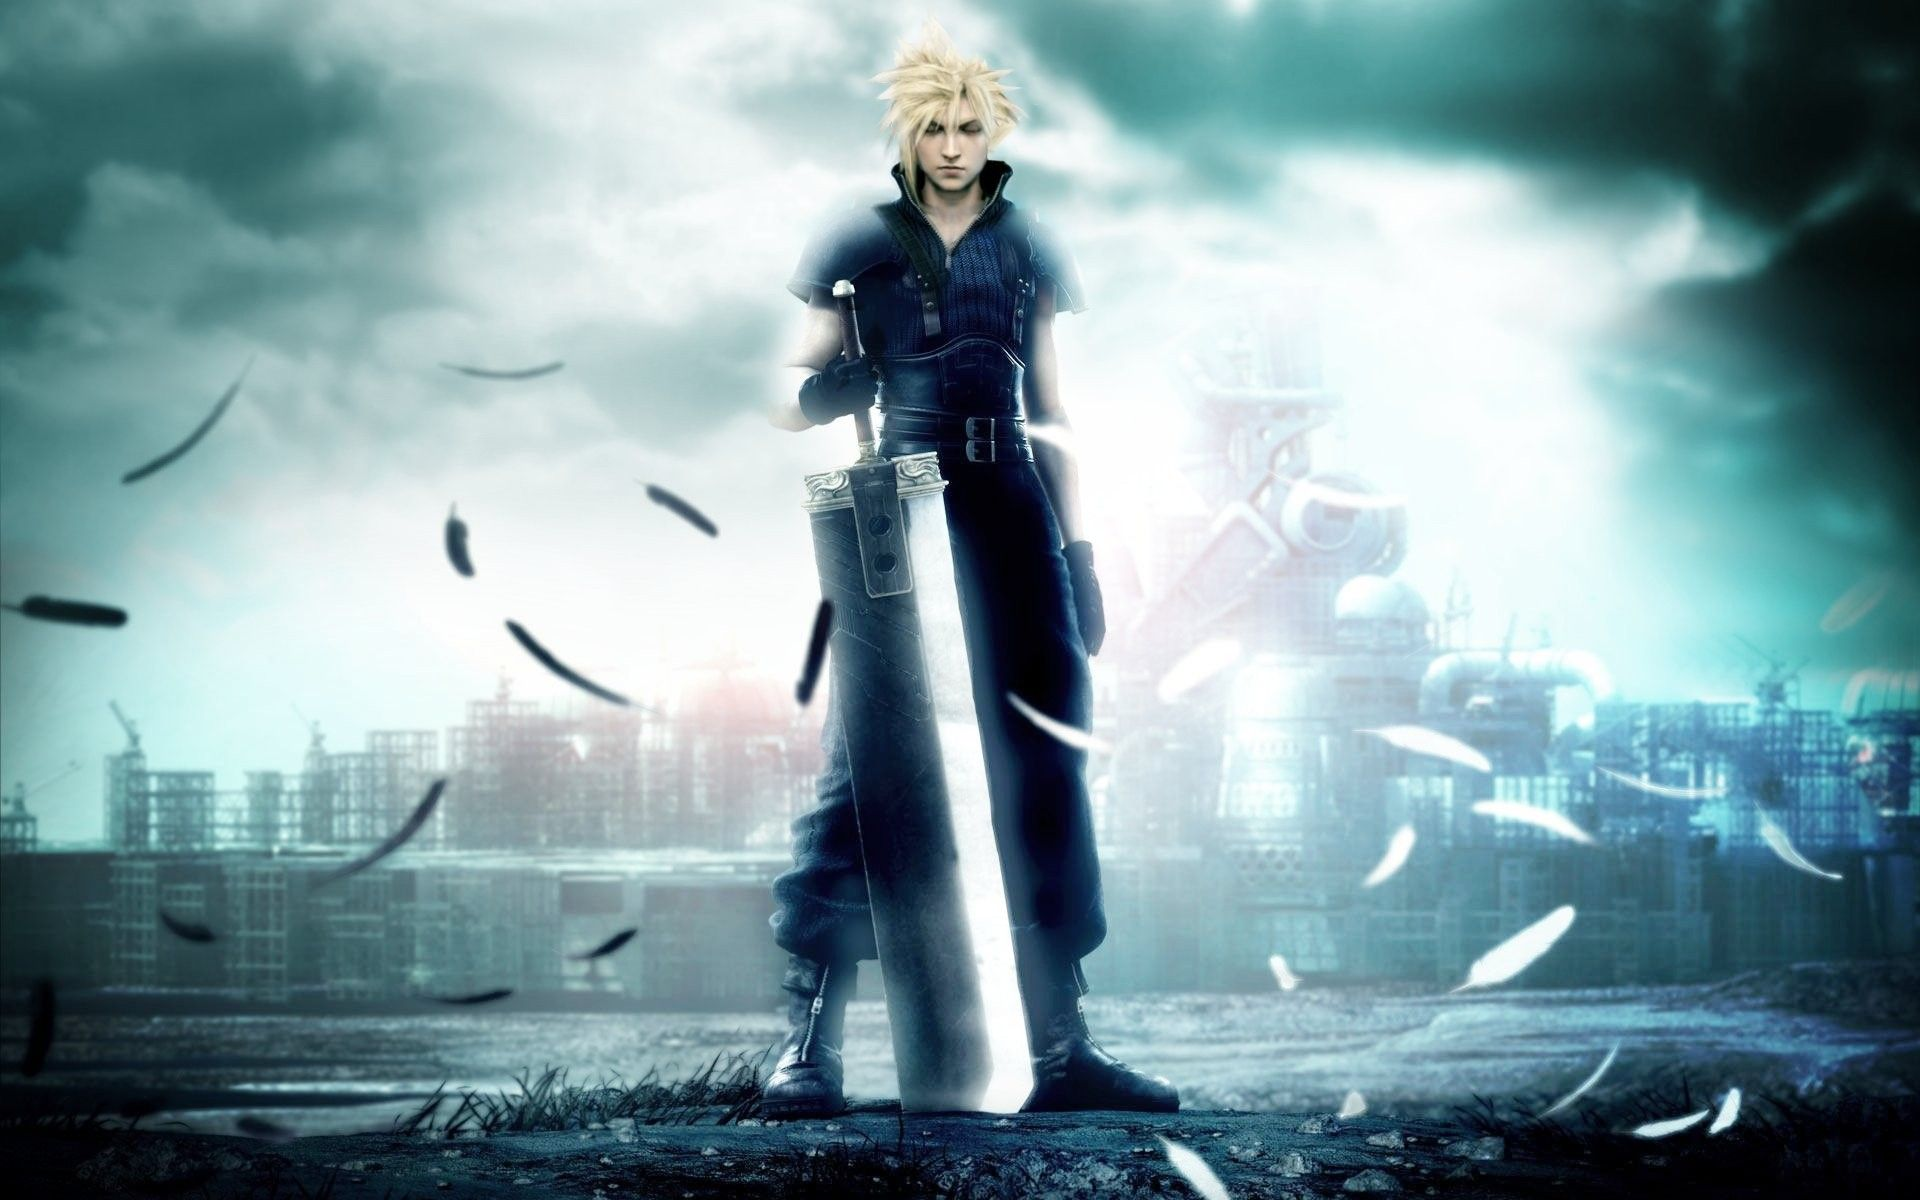 Final Fantasy Vii Cloud Strife Buster Sword Anime Final